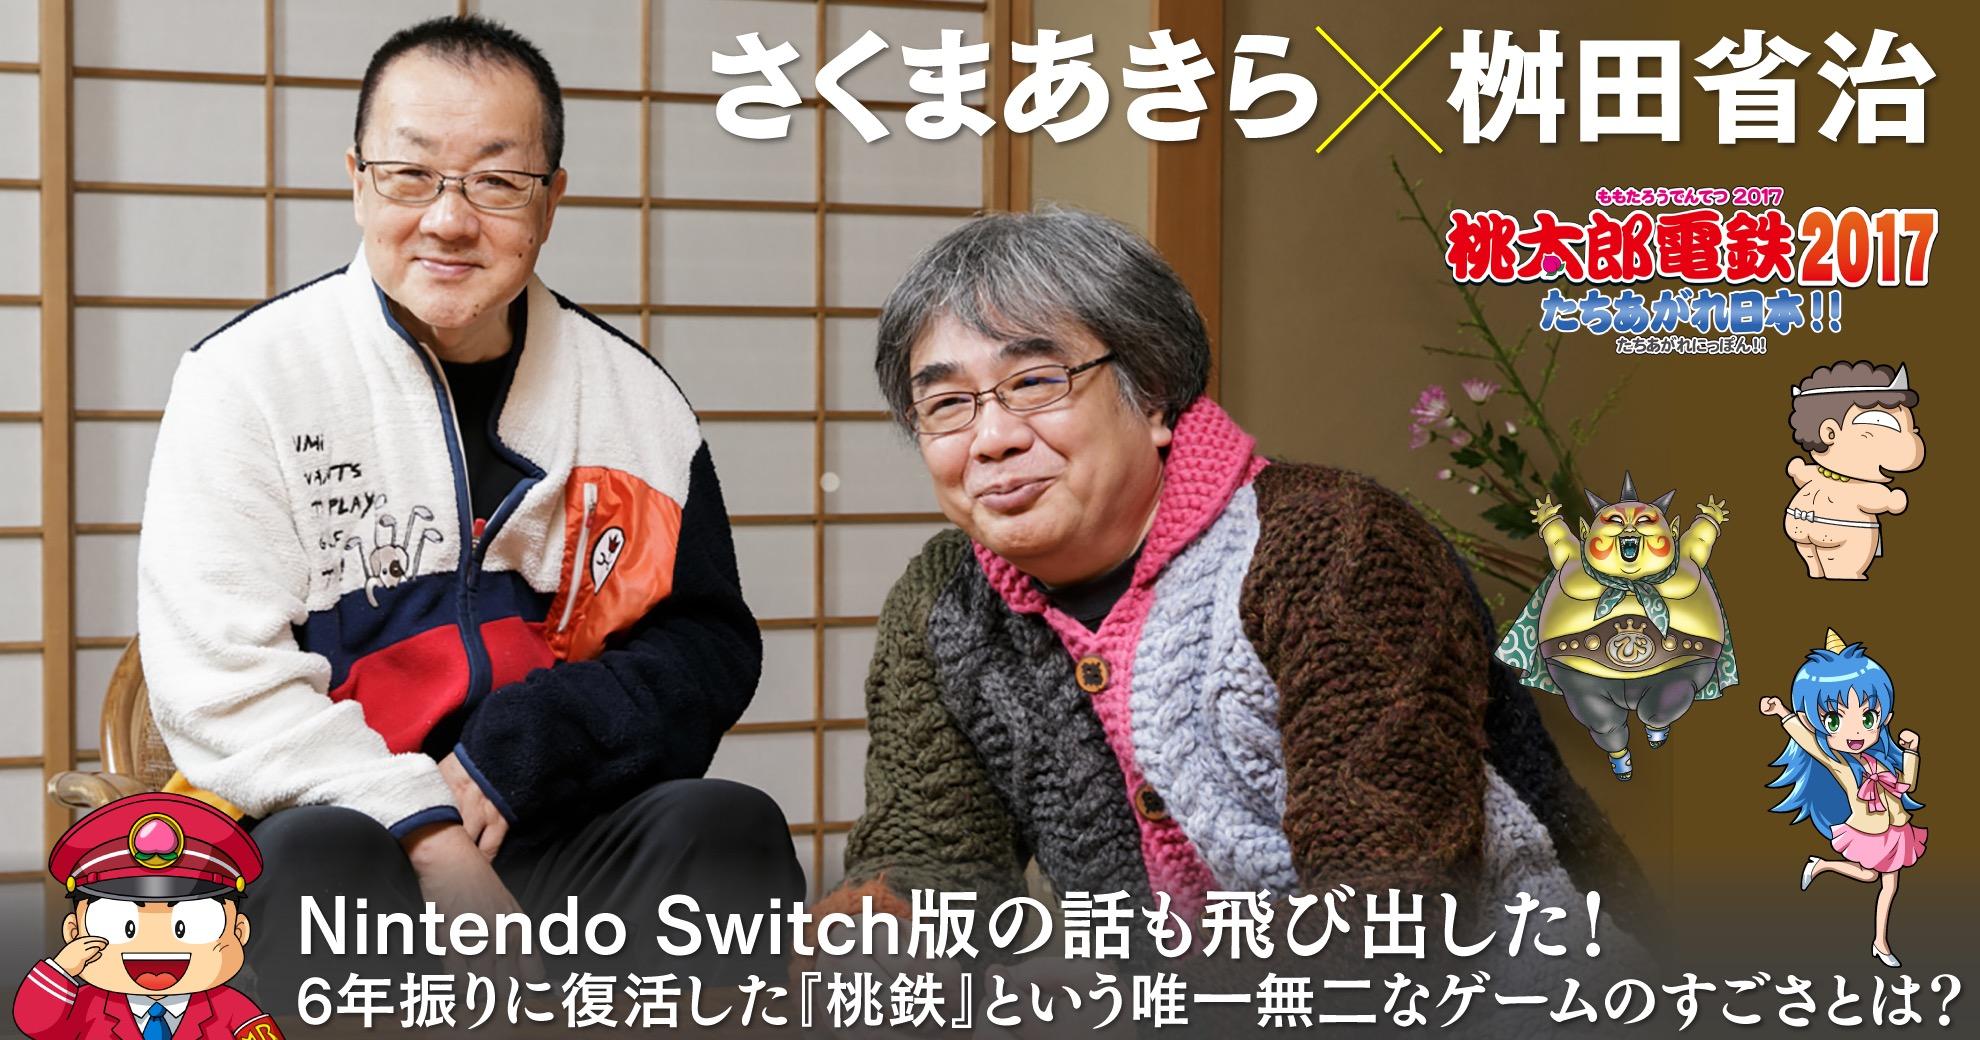 Nintendo Switch版の話も飛び出した! 6年振りに復活した『桃鉄』という唯一無二なゲームのすごさとは?